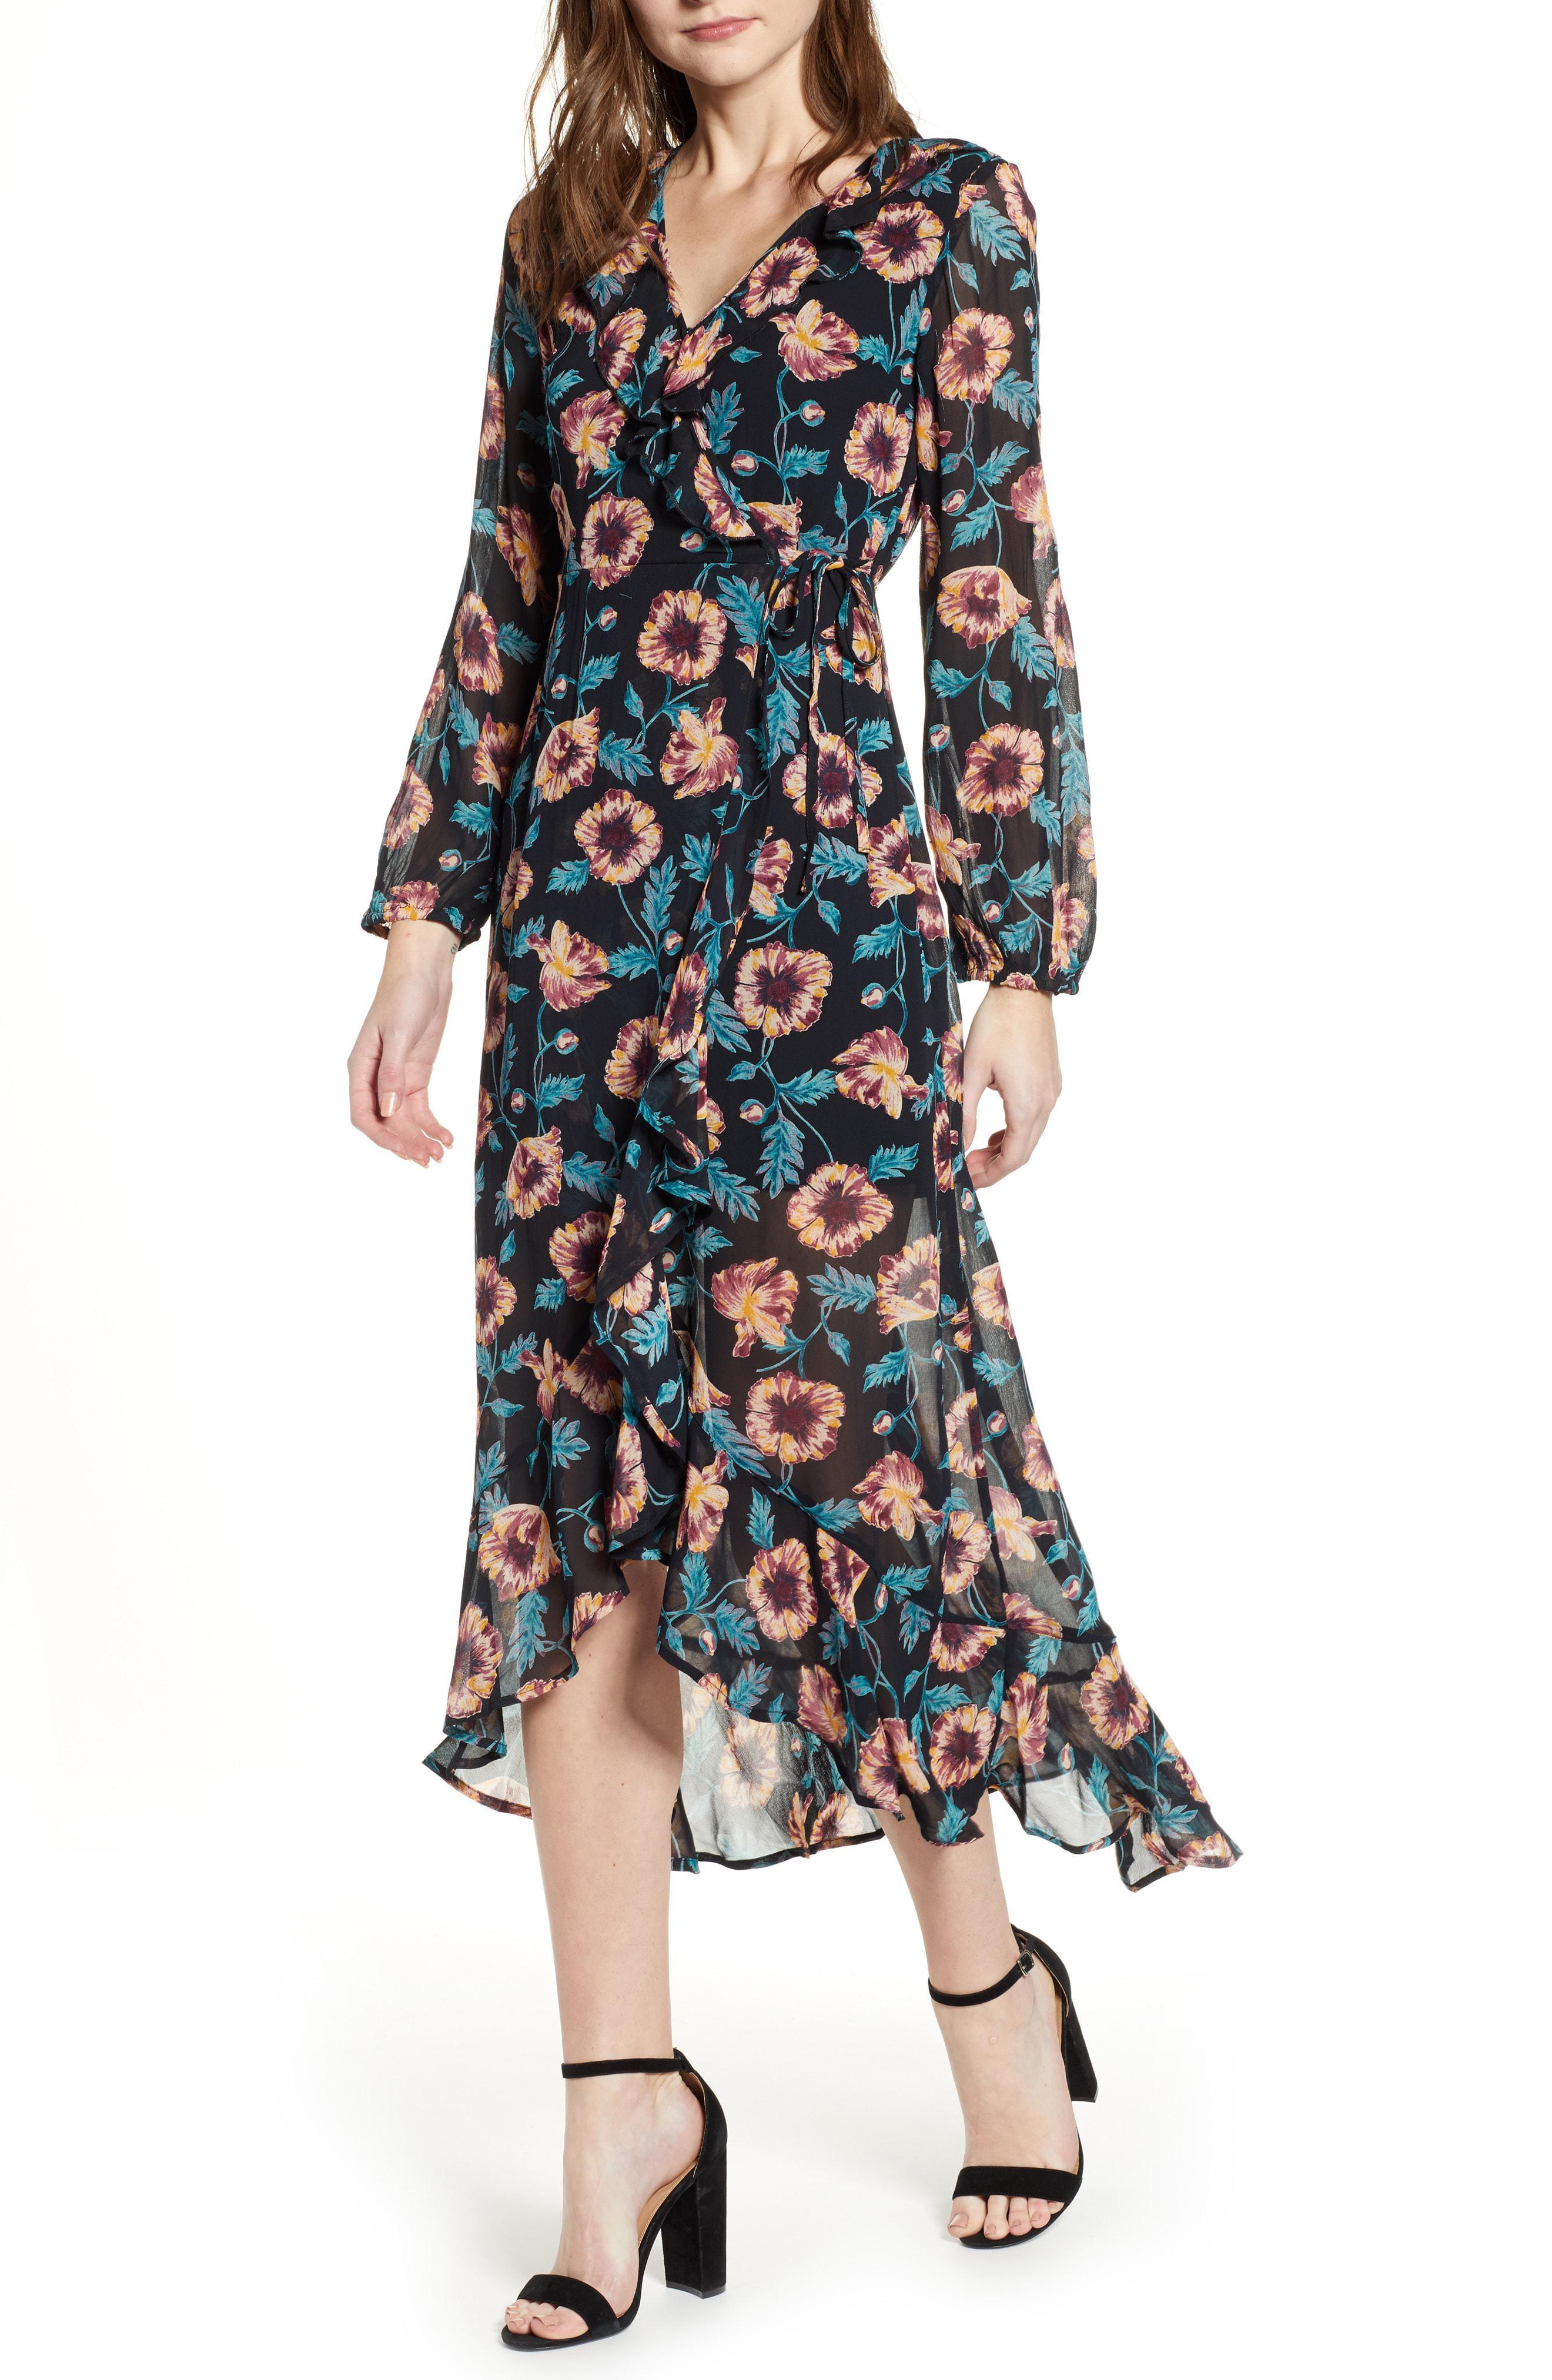 6fbaac699119 Lyst - Band Of Gypsies Reese Floral Print Midi Dress in Blue